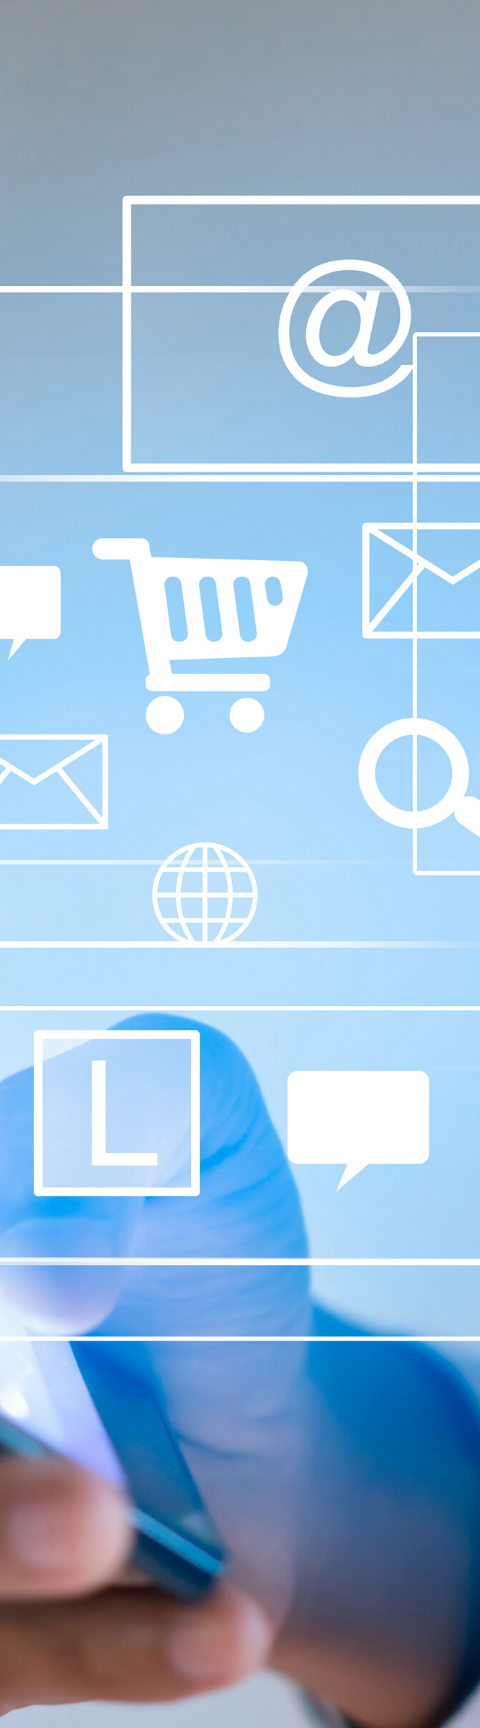 Personalisation ecommerce